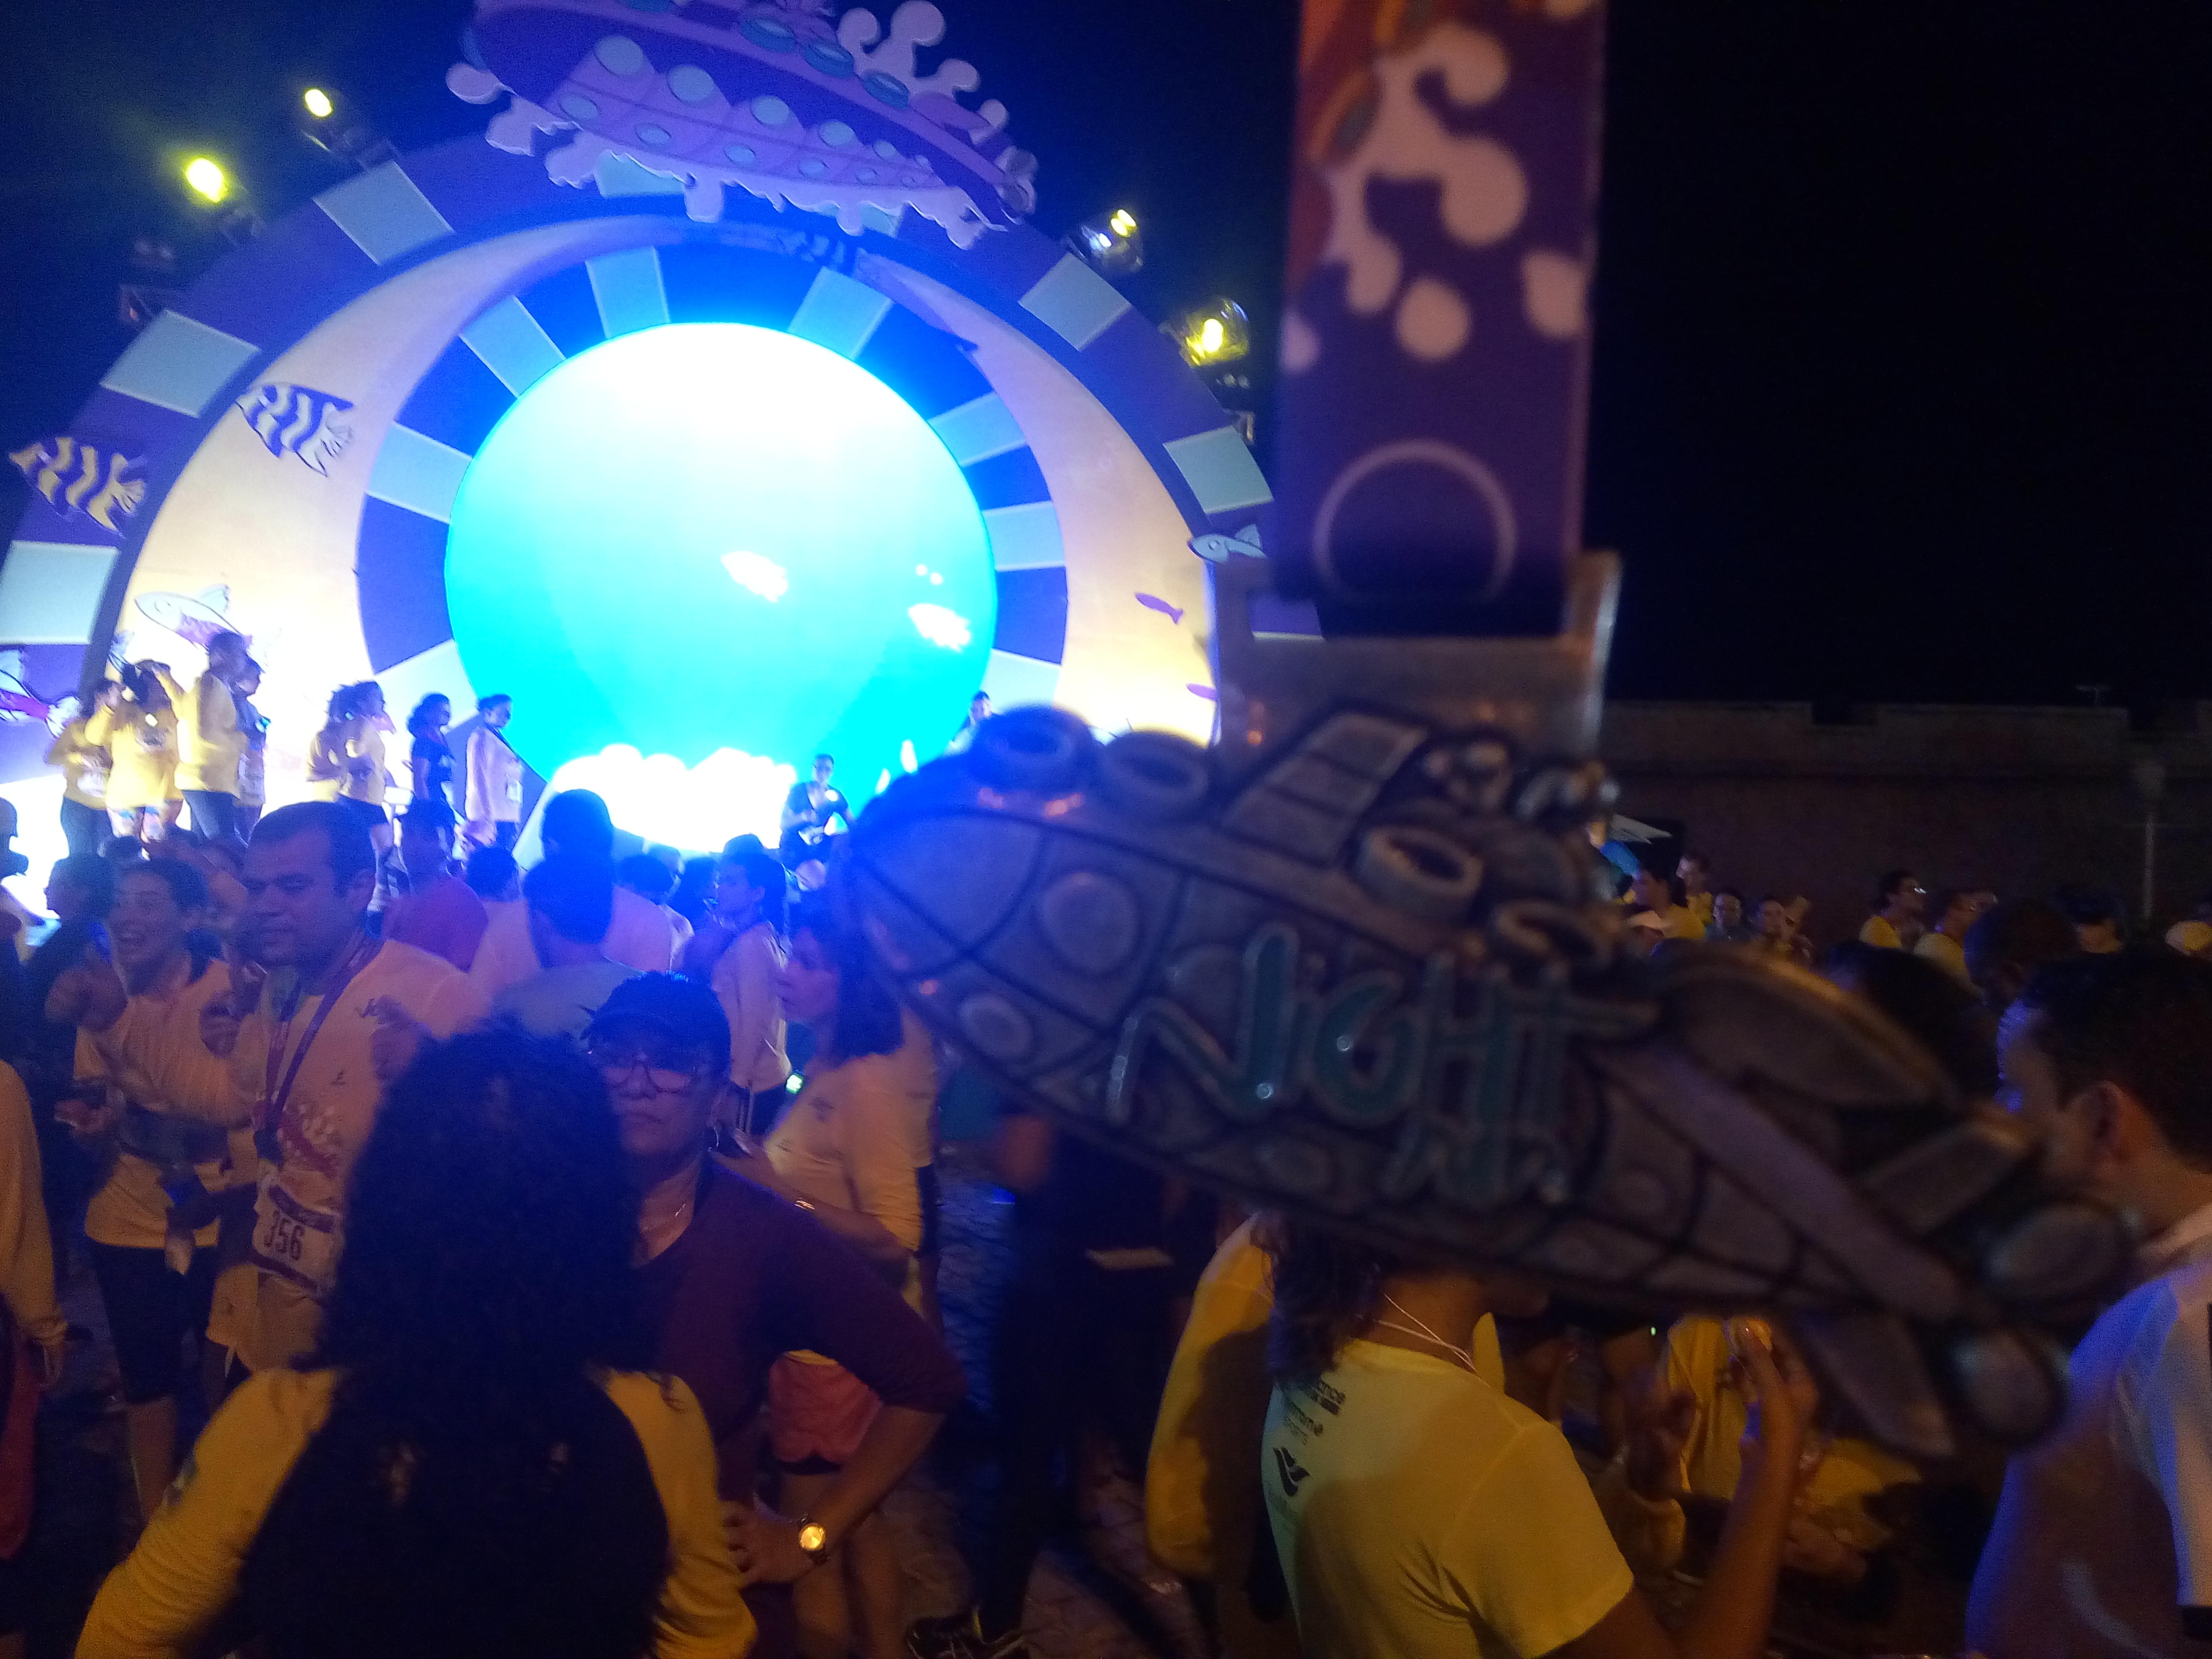 Circuito Night Run : Sulamérica apresenta up night run em porto alegre revista cobertura